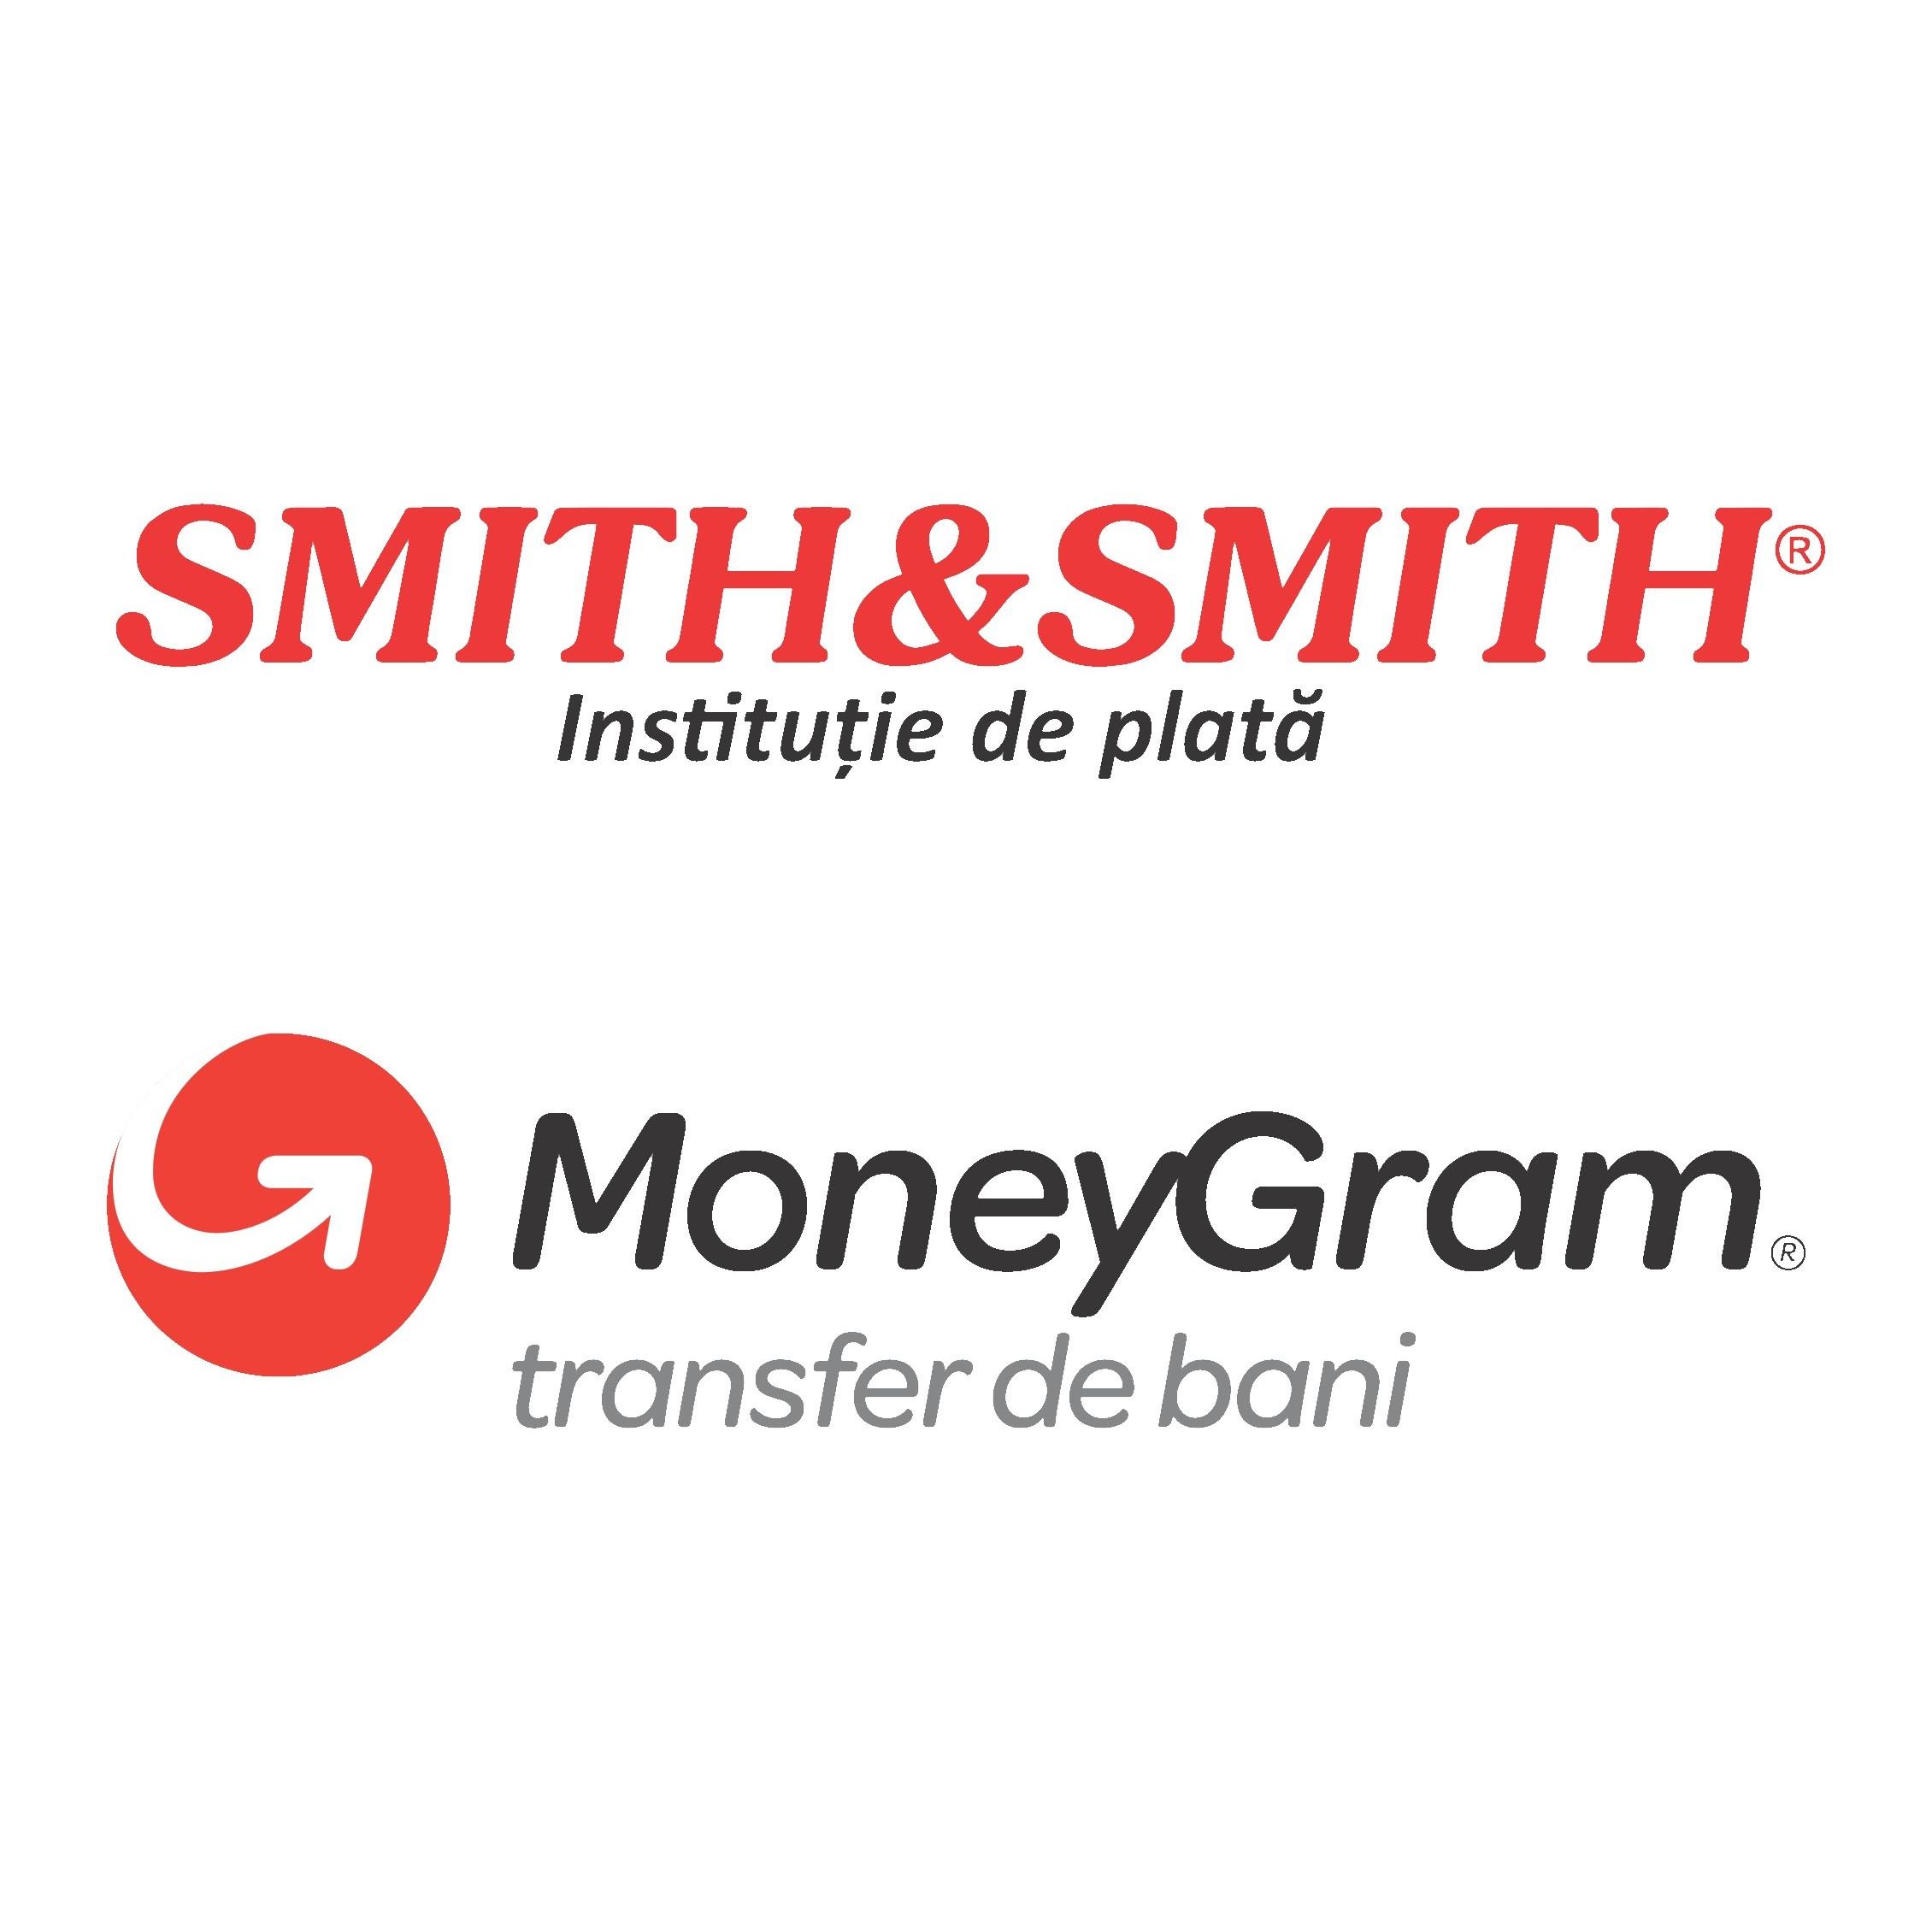 transfer de bani exchange smith zalau value centre